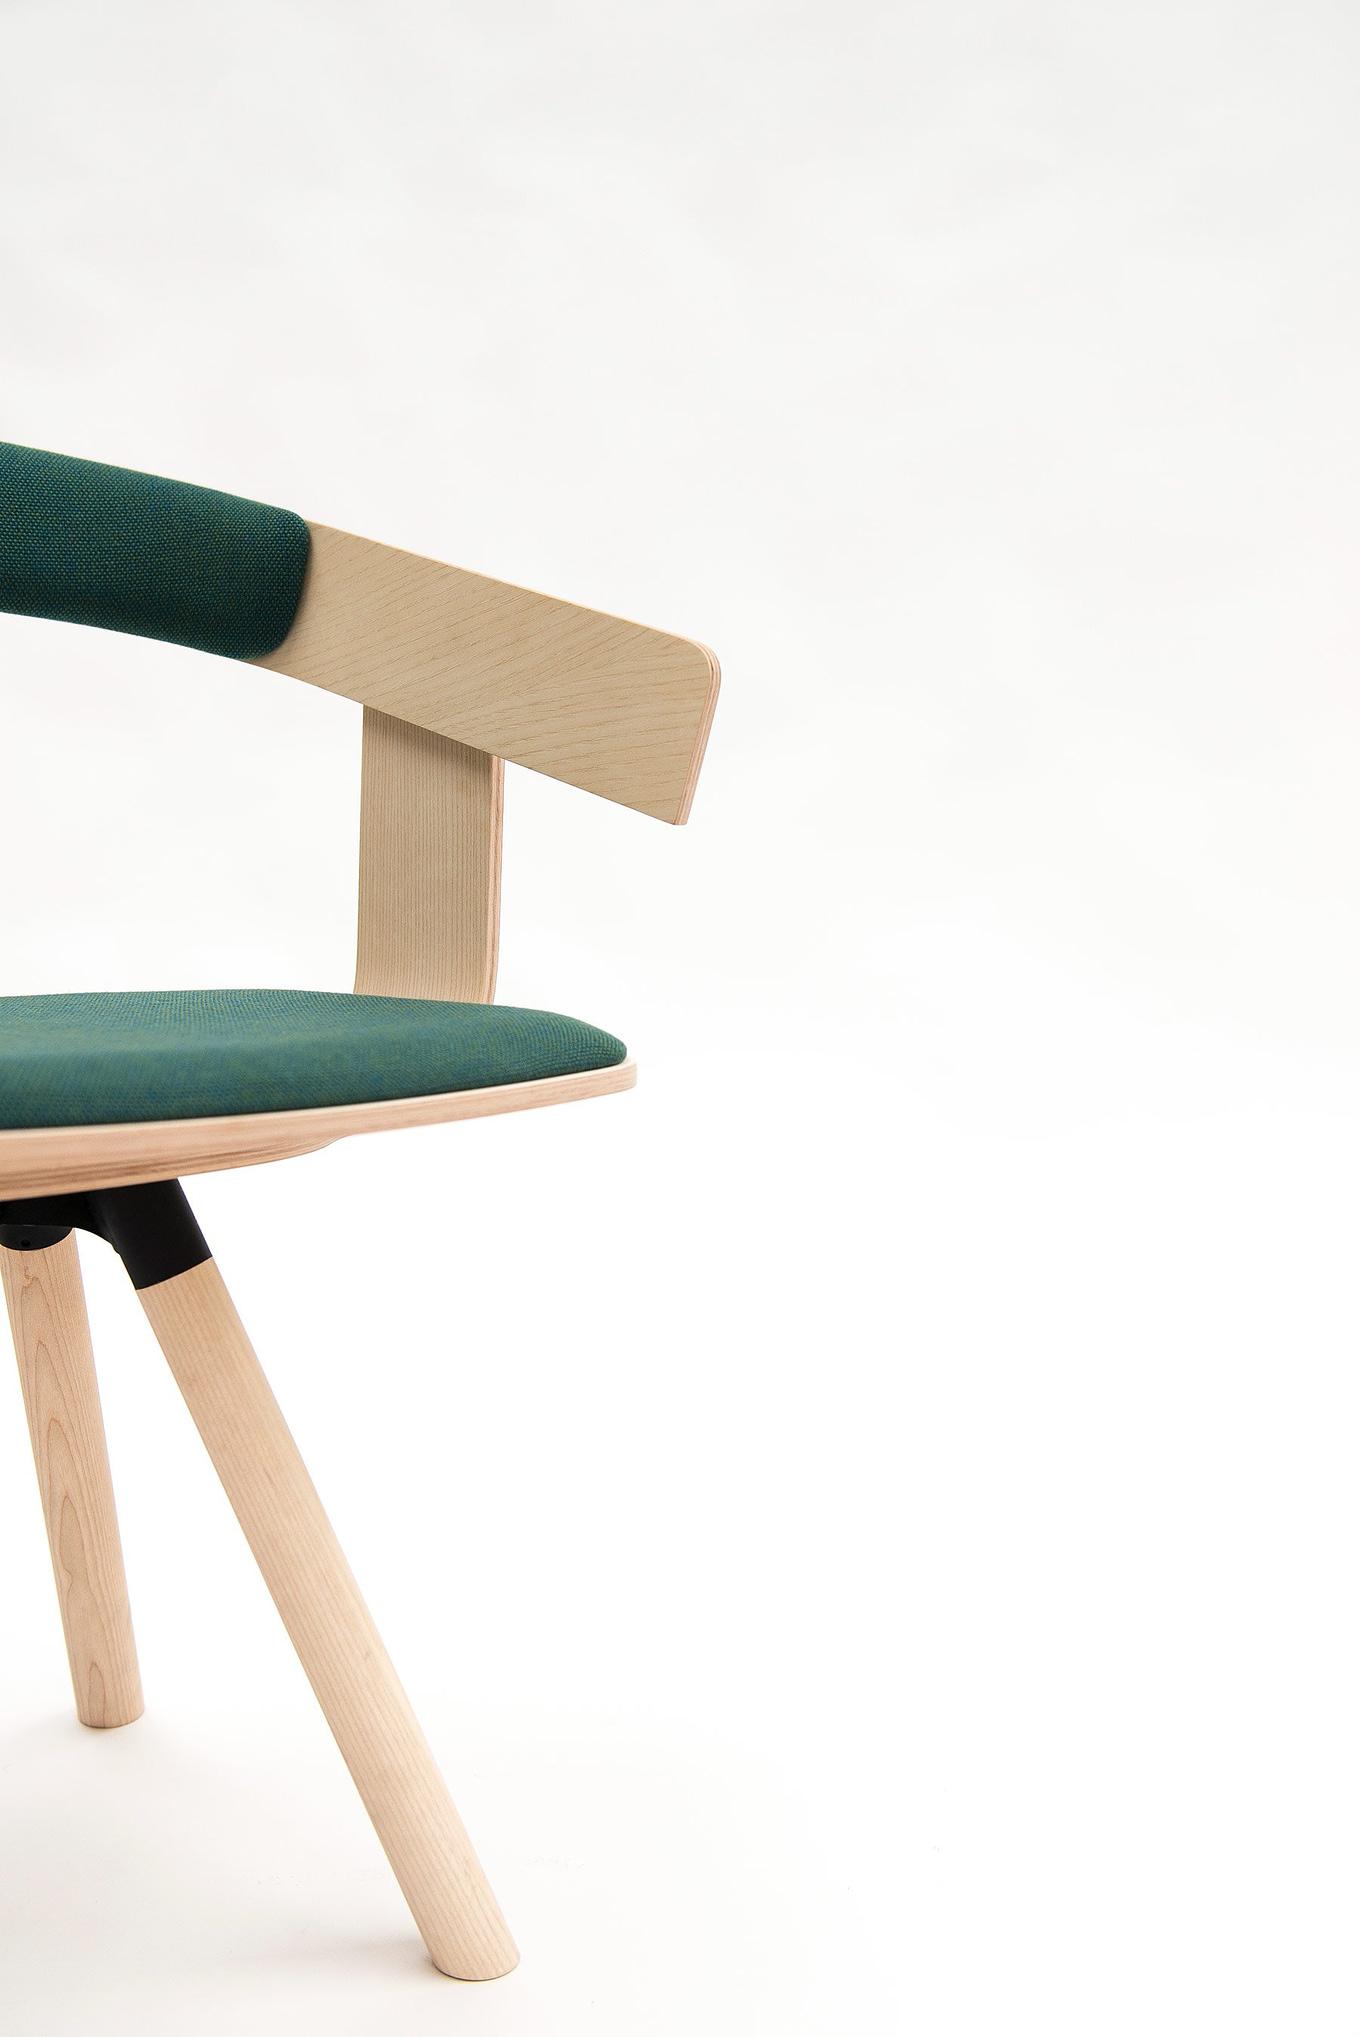 buzzifloat-chair-alain-gilles-gessato-14